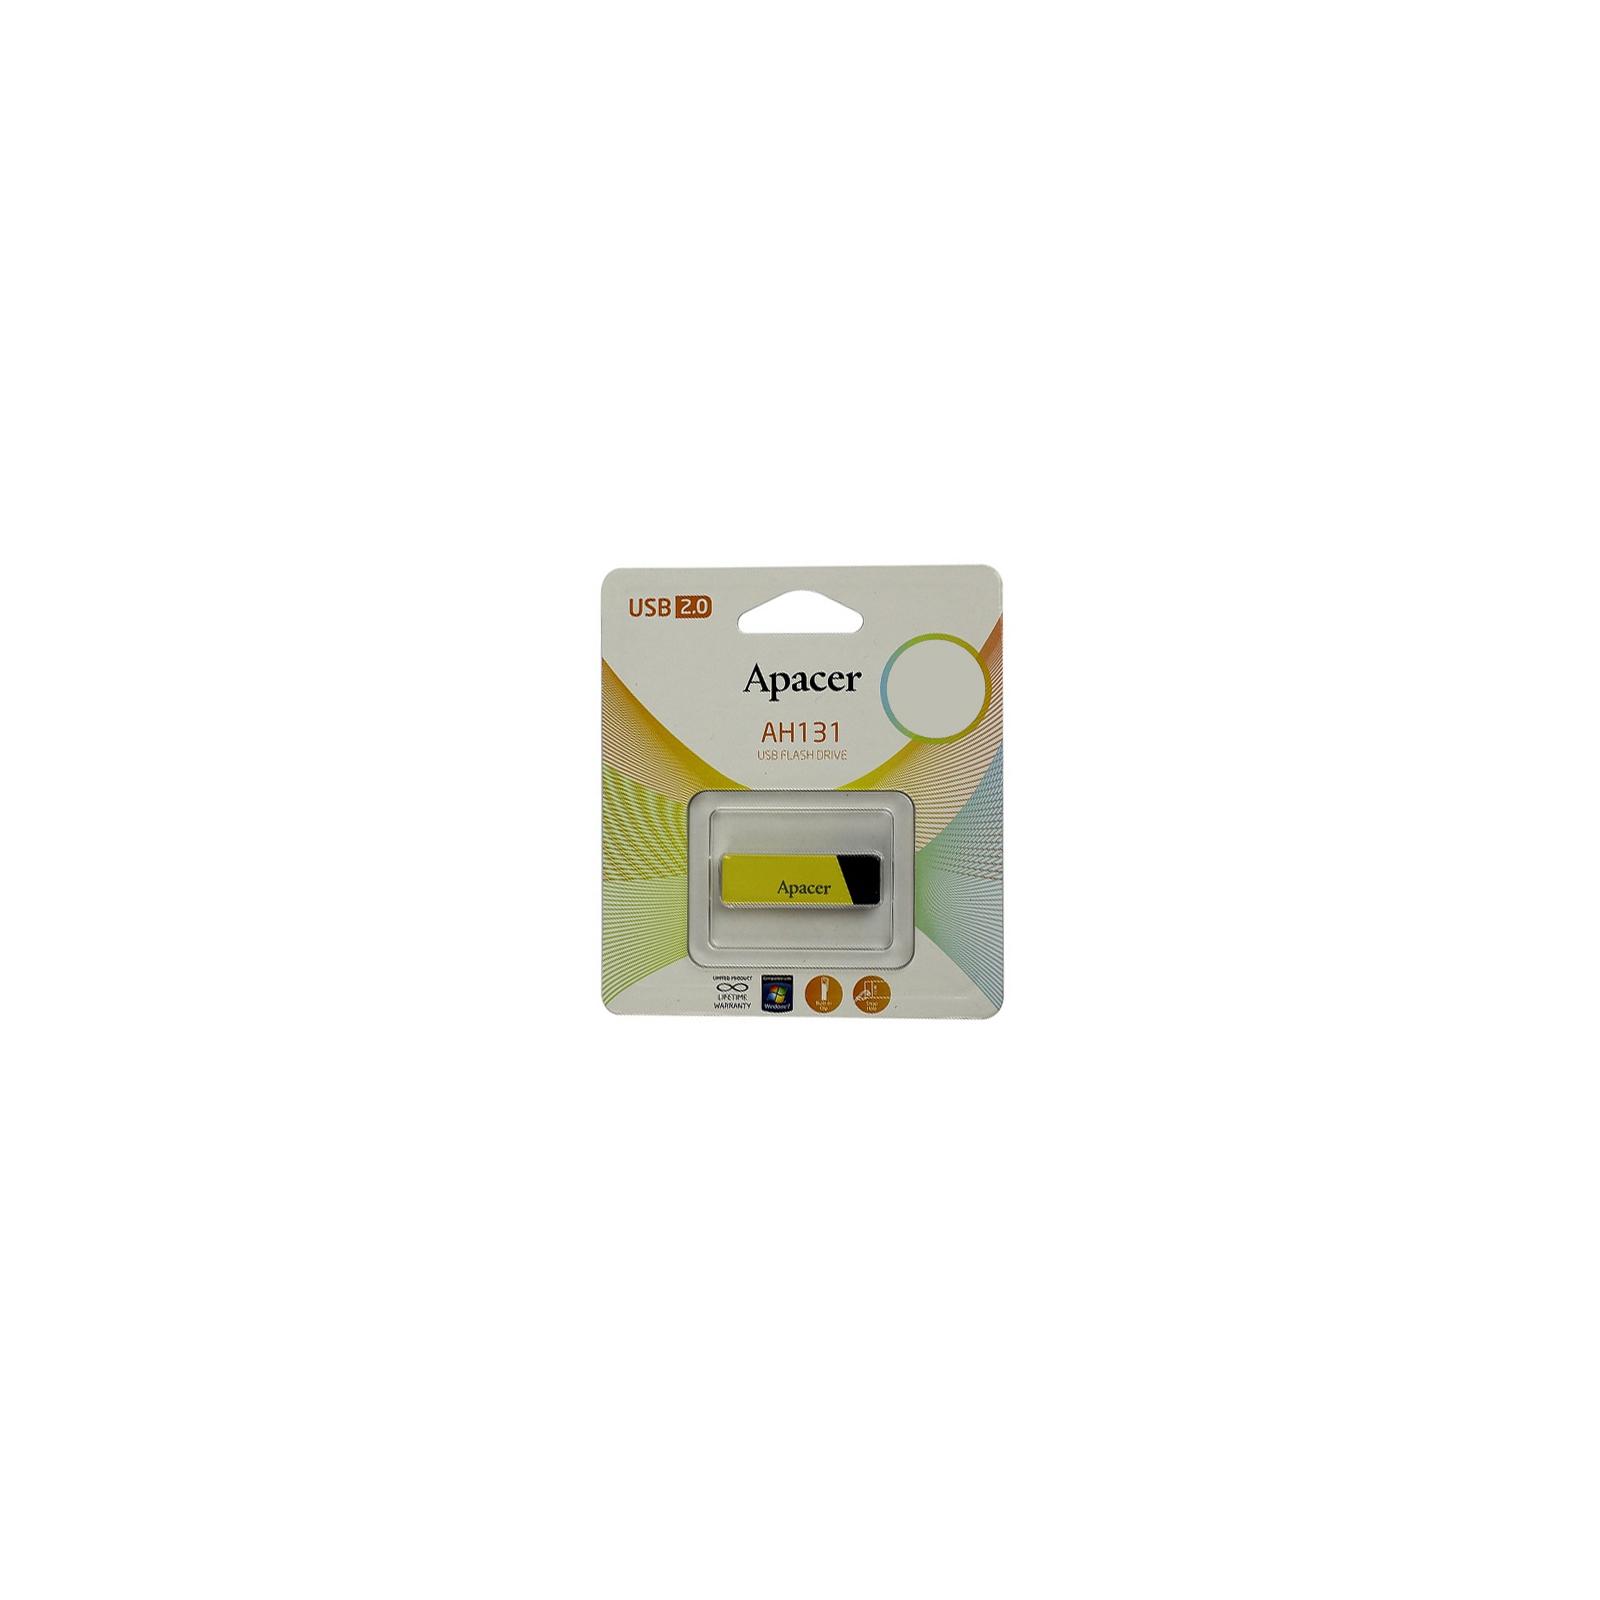 USB флеш накопитель 8GB AH131 Yellow RP USB2.0 Apacer (AP8GAH131Y-1) изображение 6